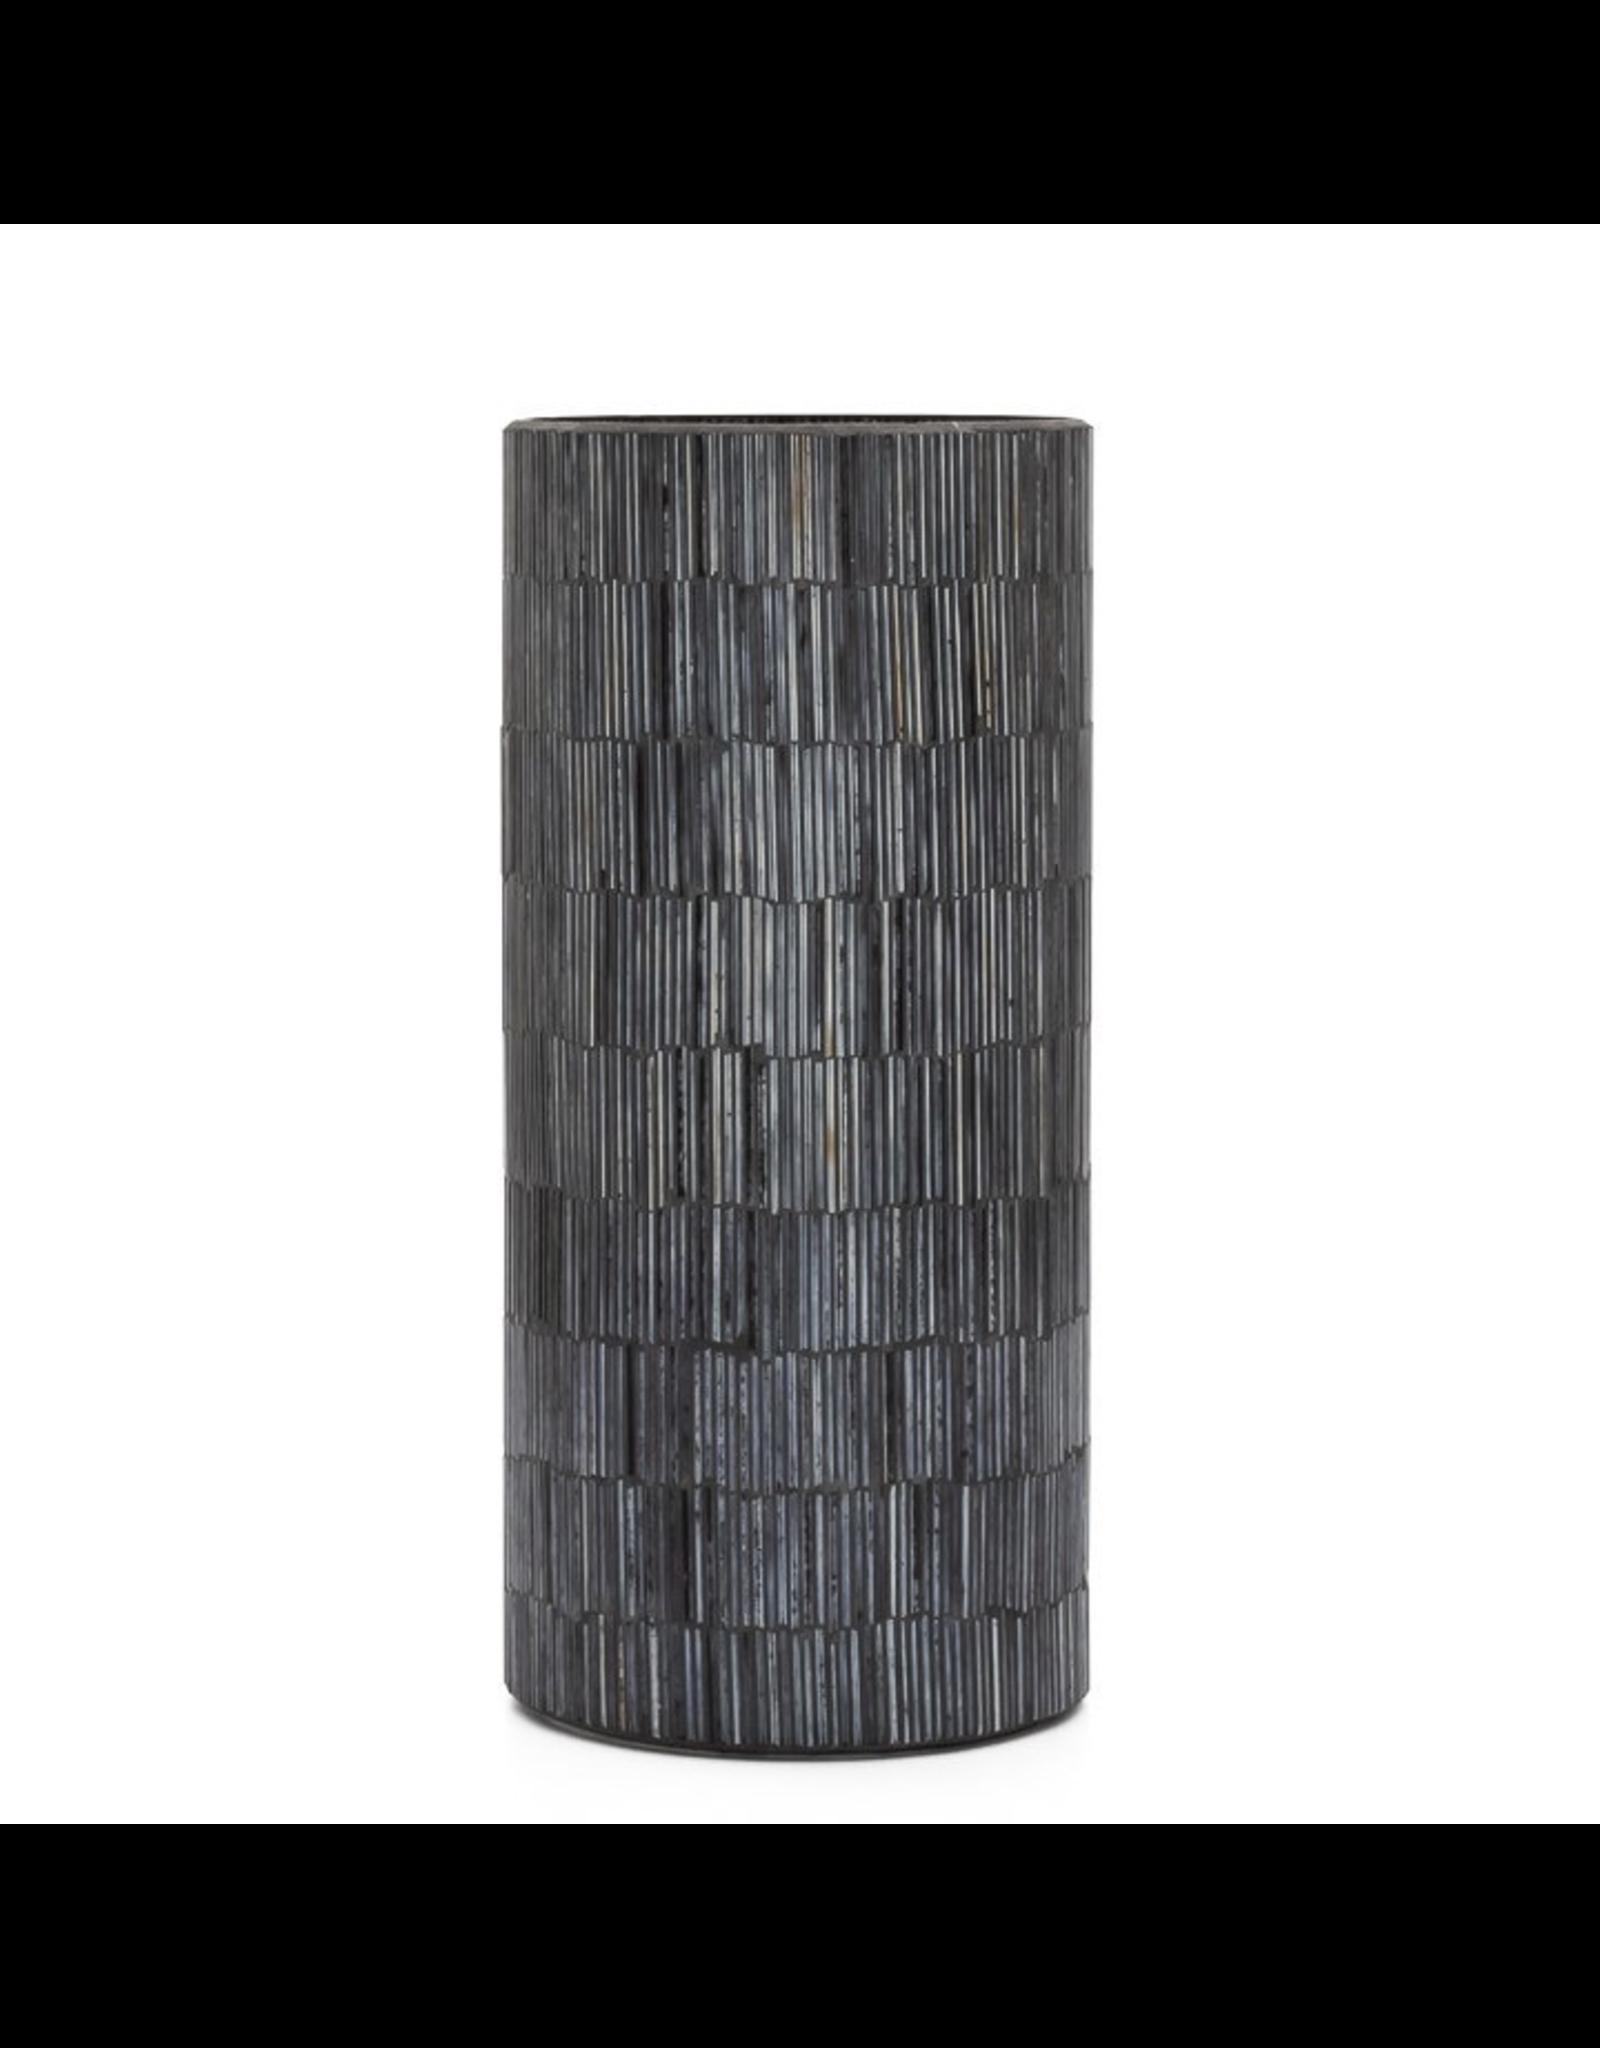 "Torre & Tagus Black Bamboo Mosaic 9"" Vase"